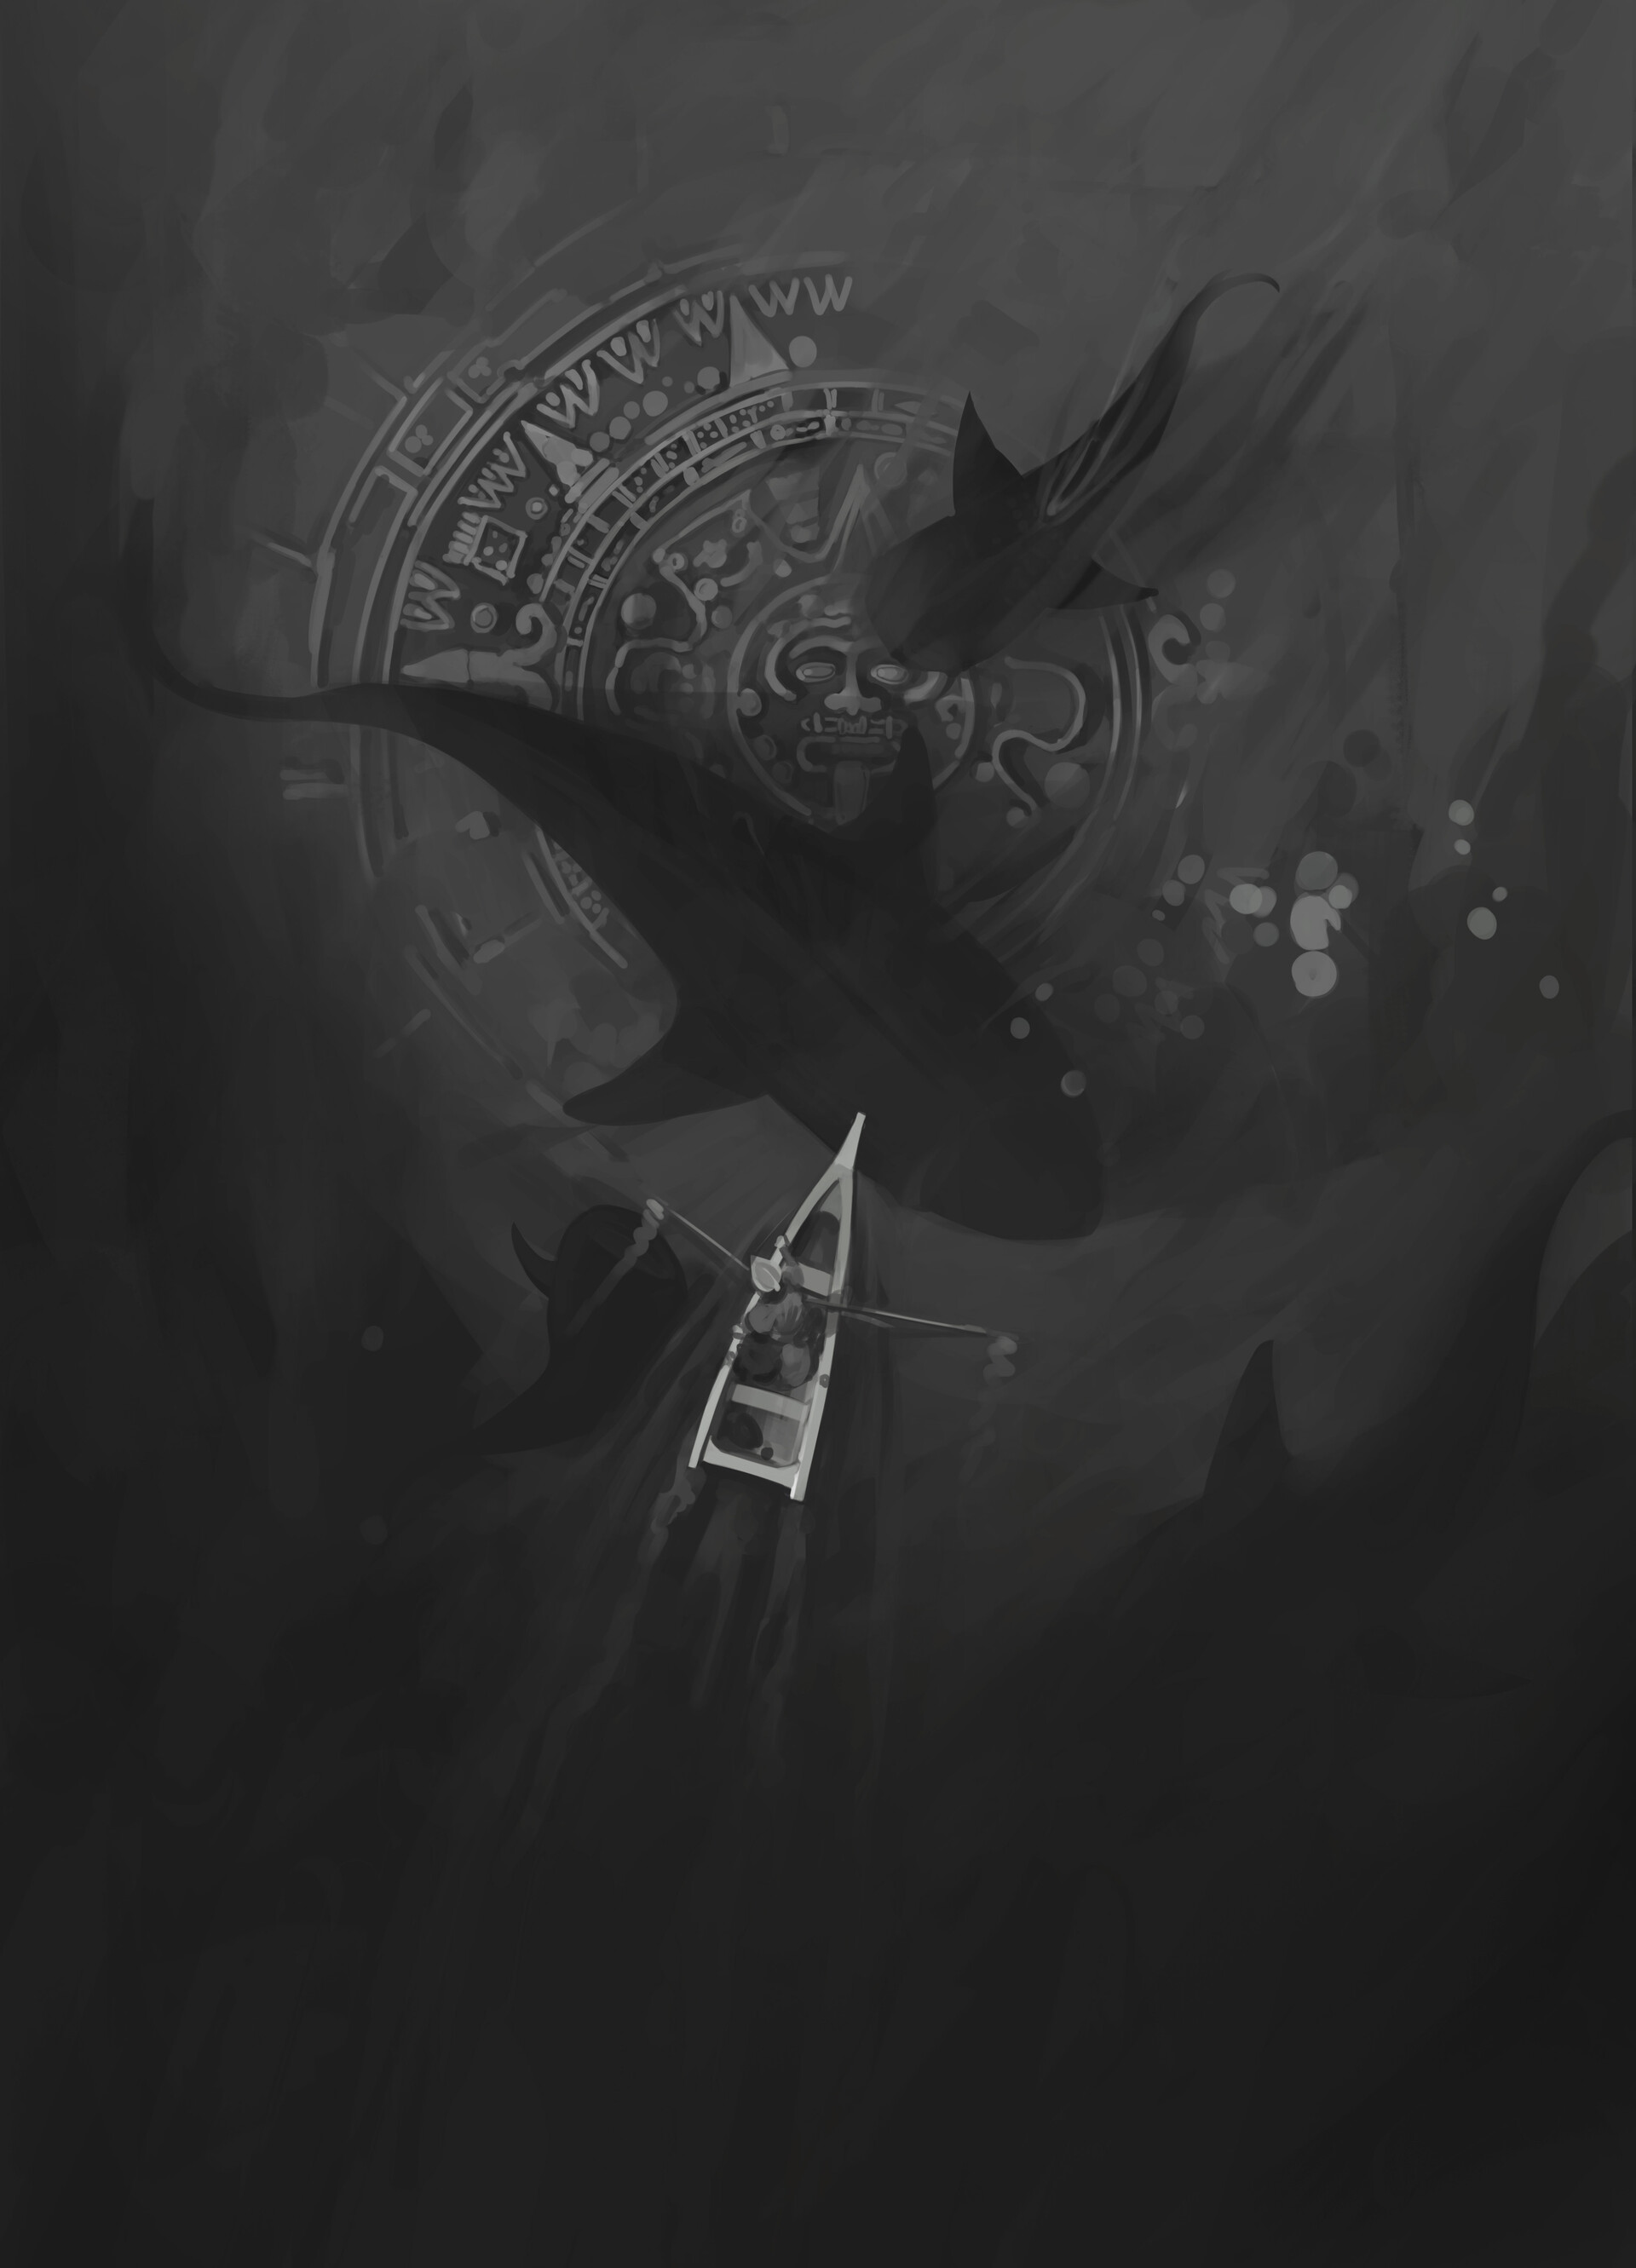 Igor artyomenko horor 51